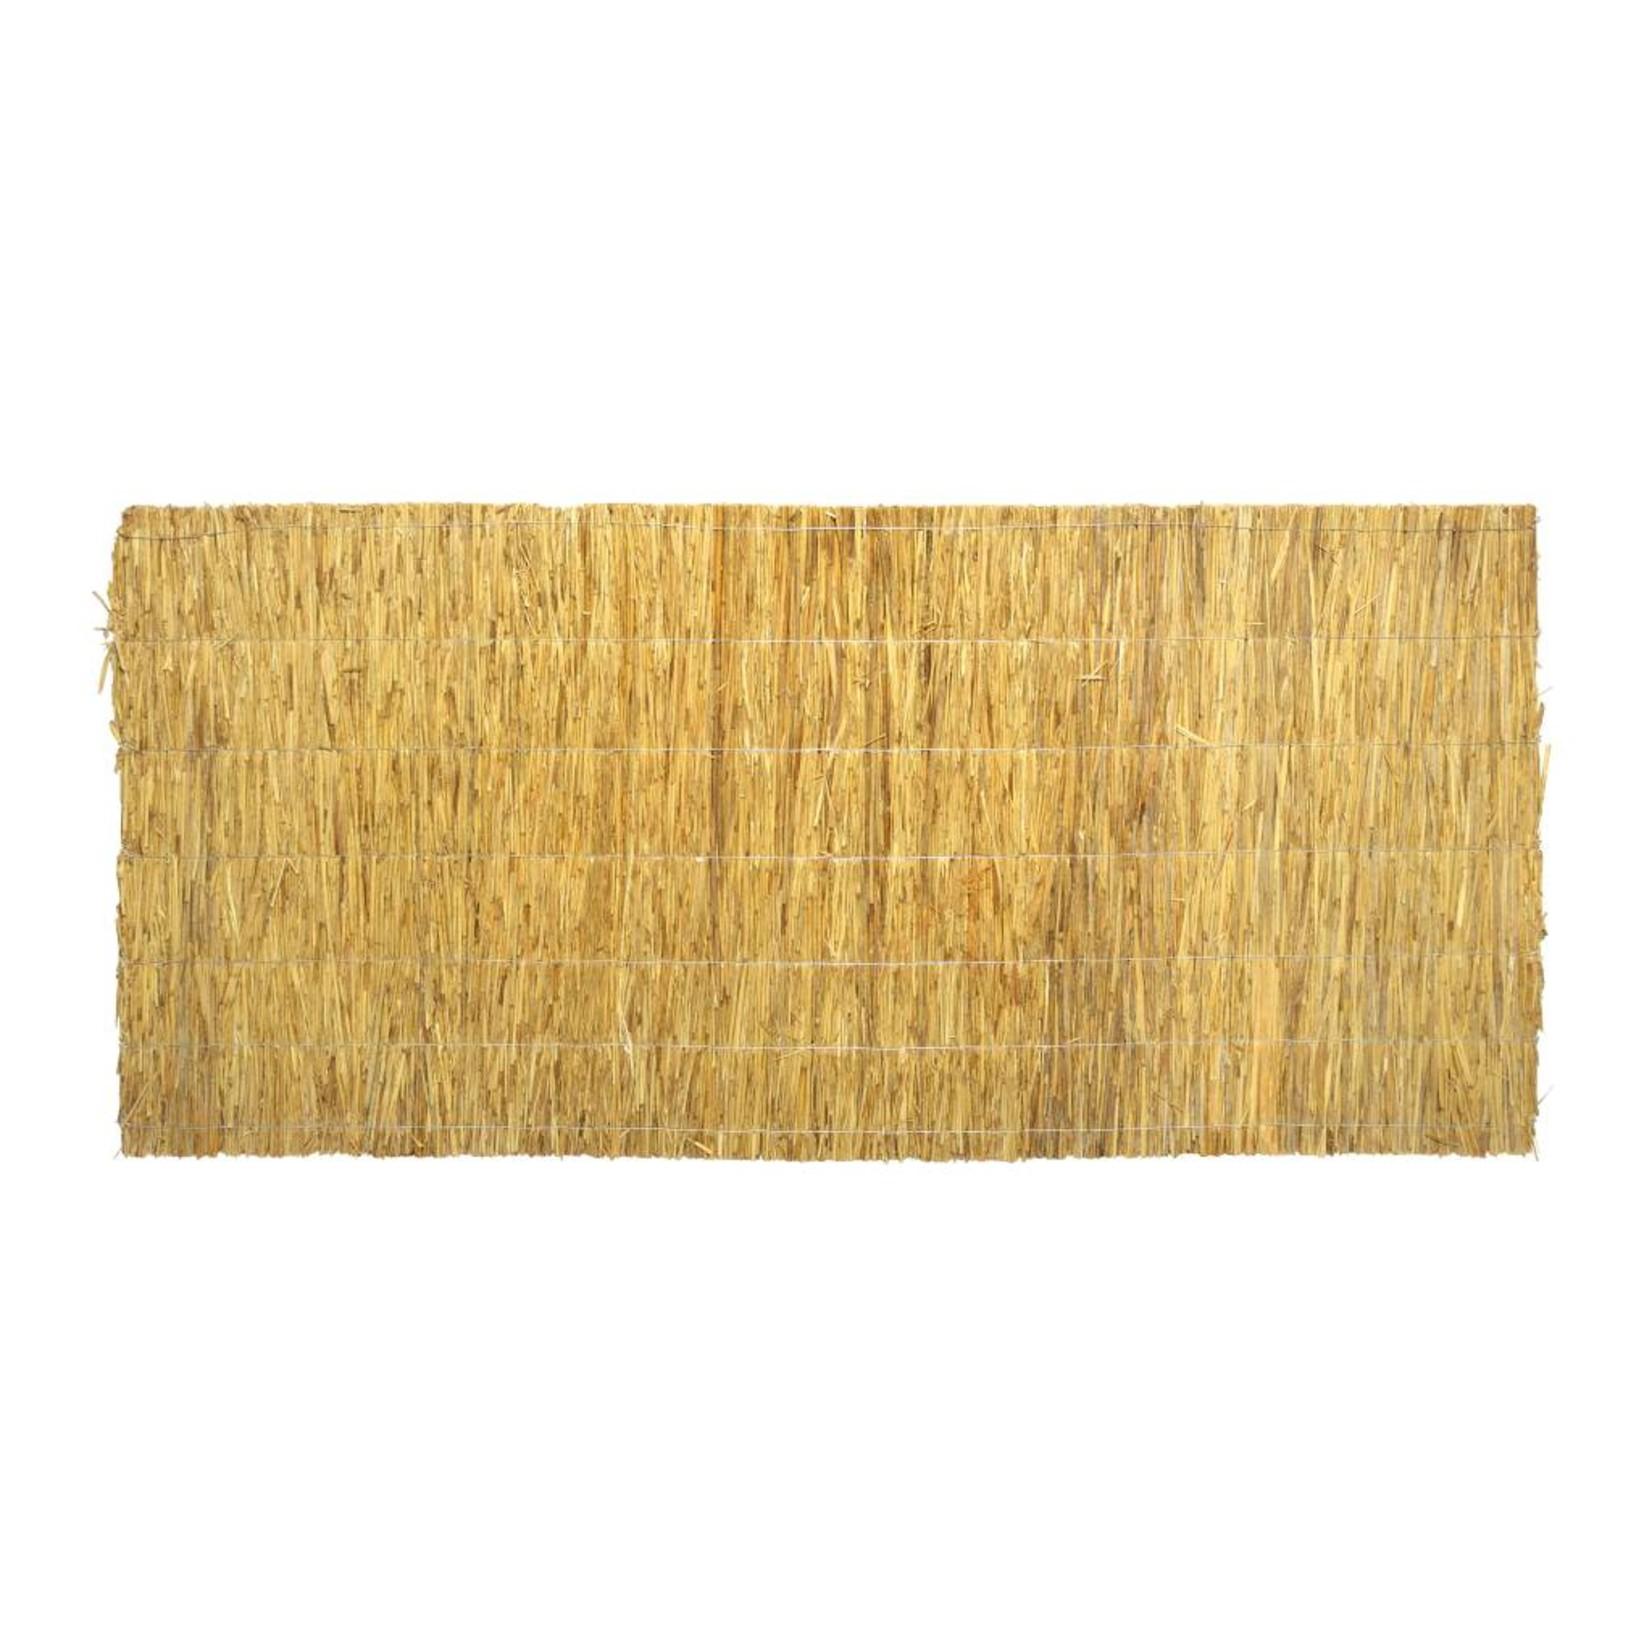 TuinChamp Rietplaat 3 cm dik 150 x 200 cm